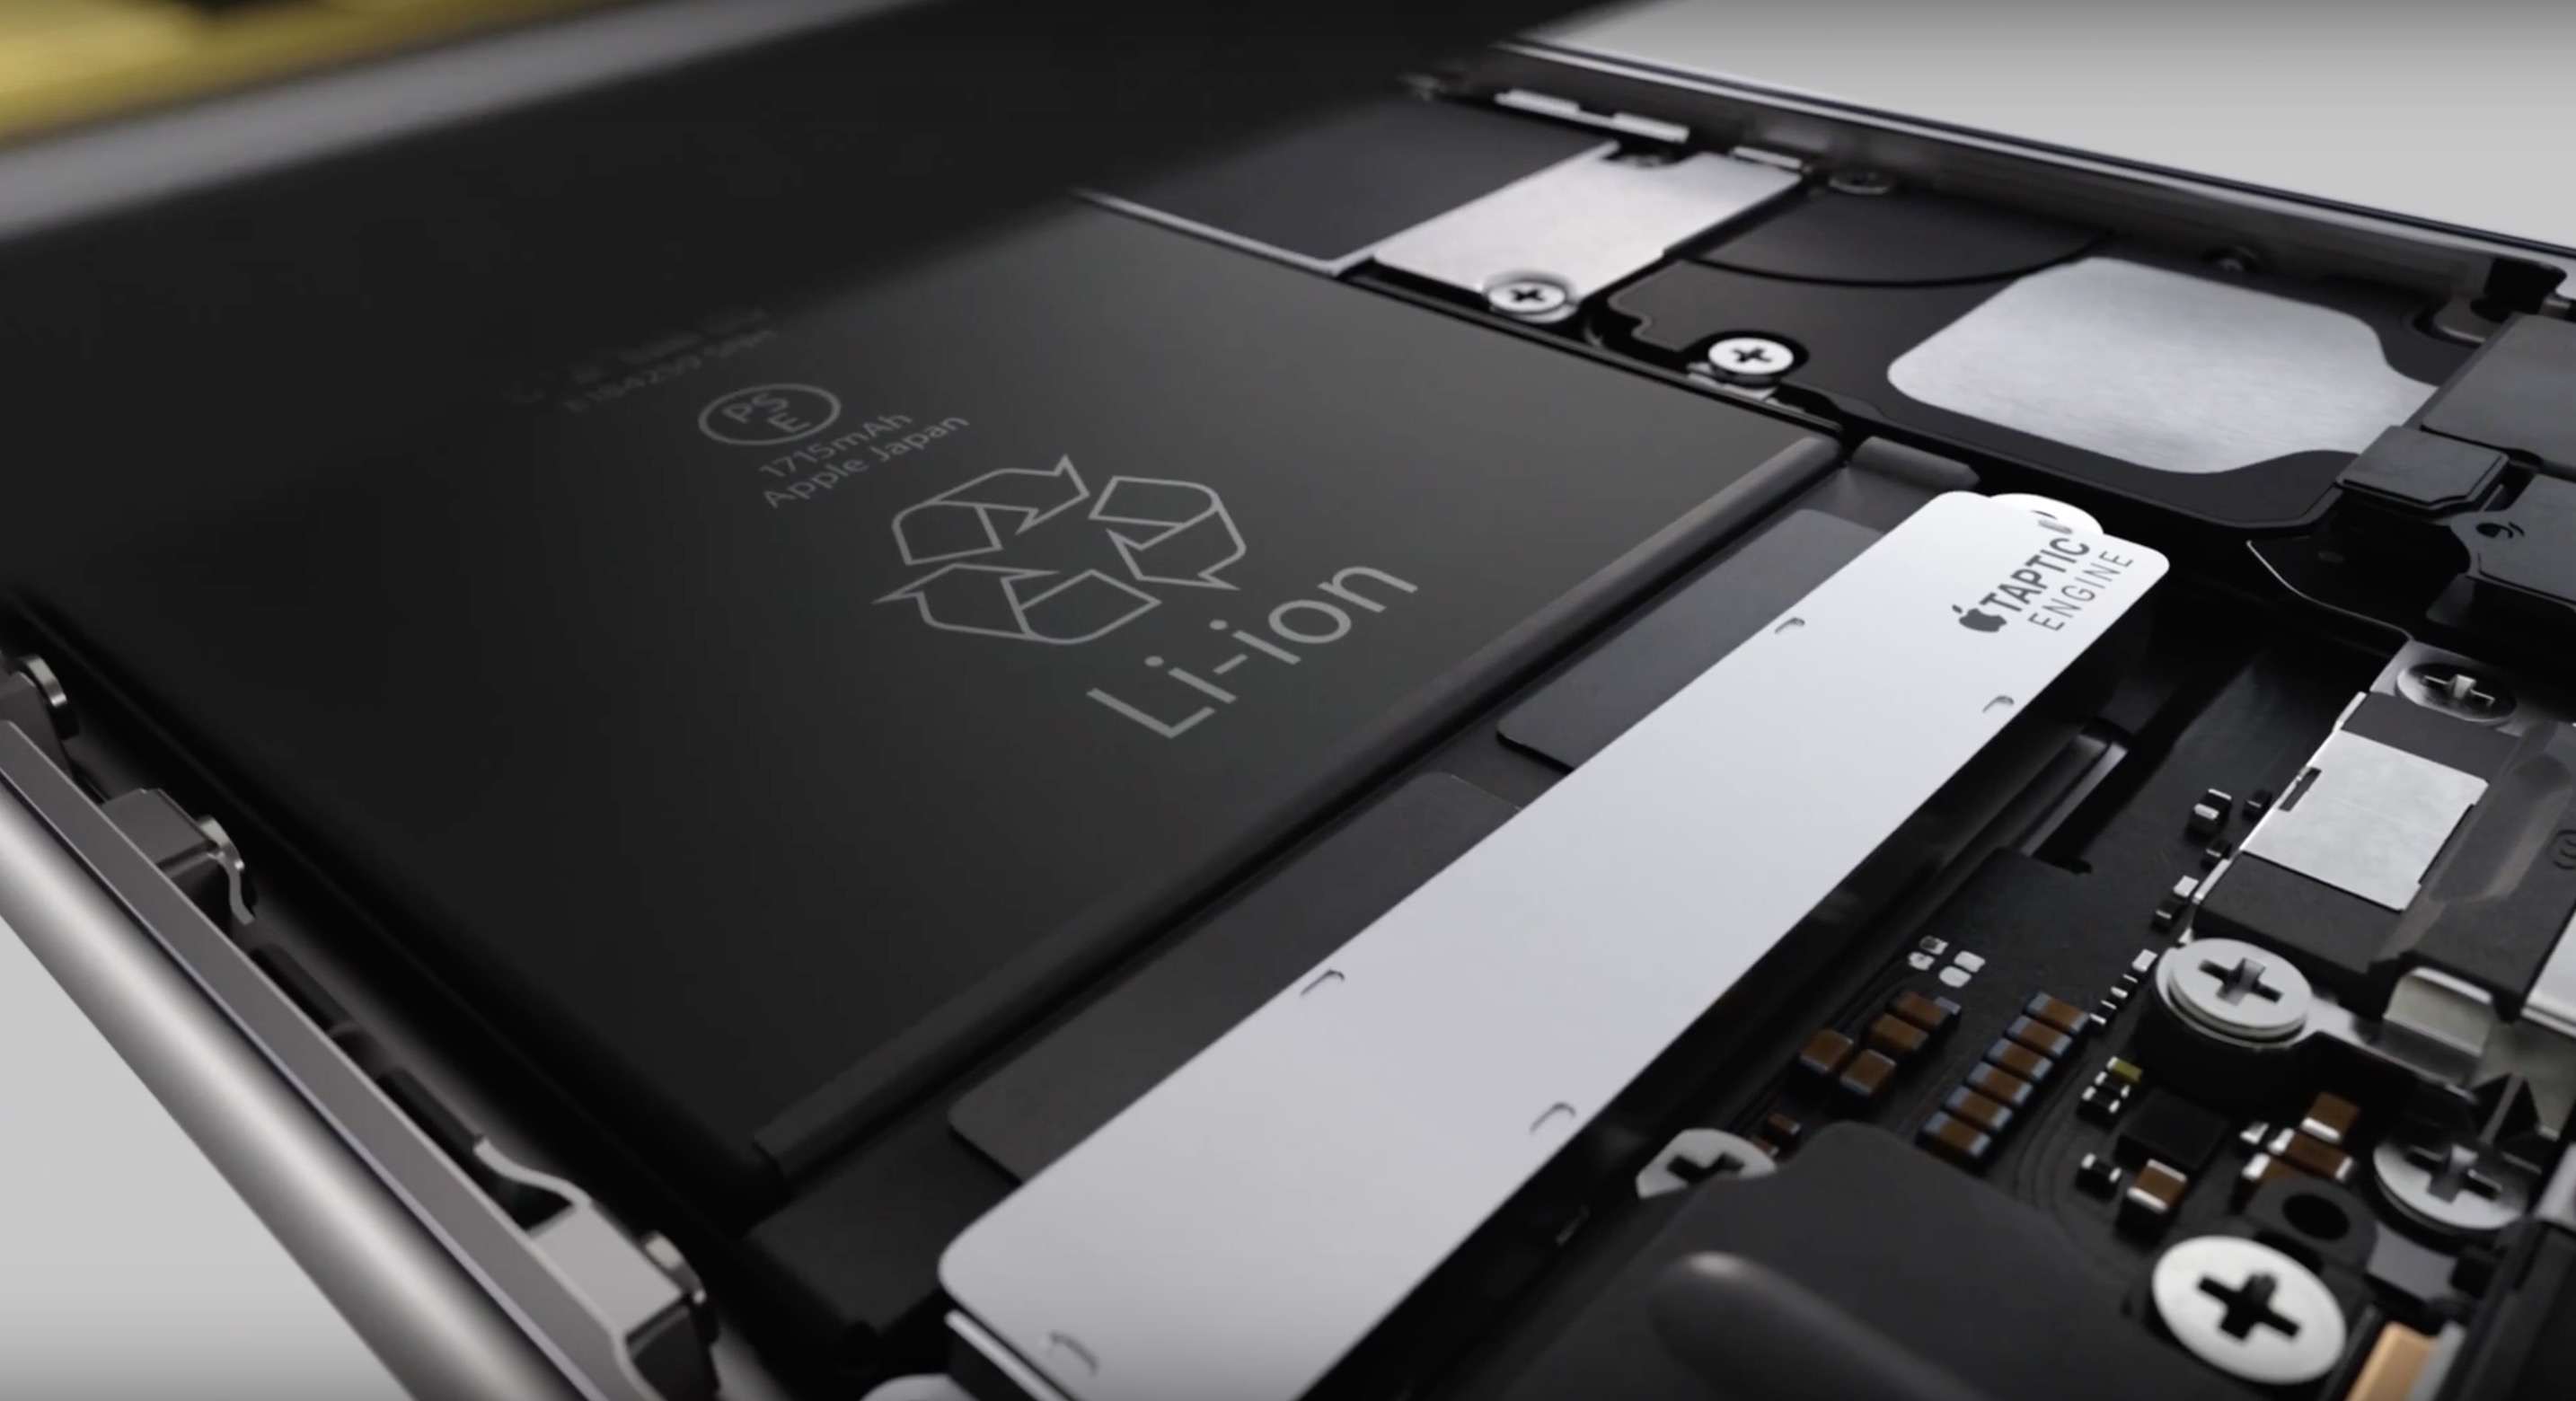 iphone 6s specs et volutions des smartphones haut de gamme d 39 apple iphone x 8 ipad et. Black Bedroom Furniture Sets. Home Design Ideas